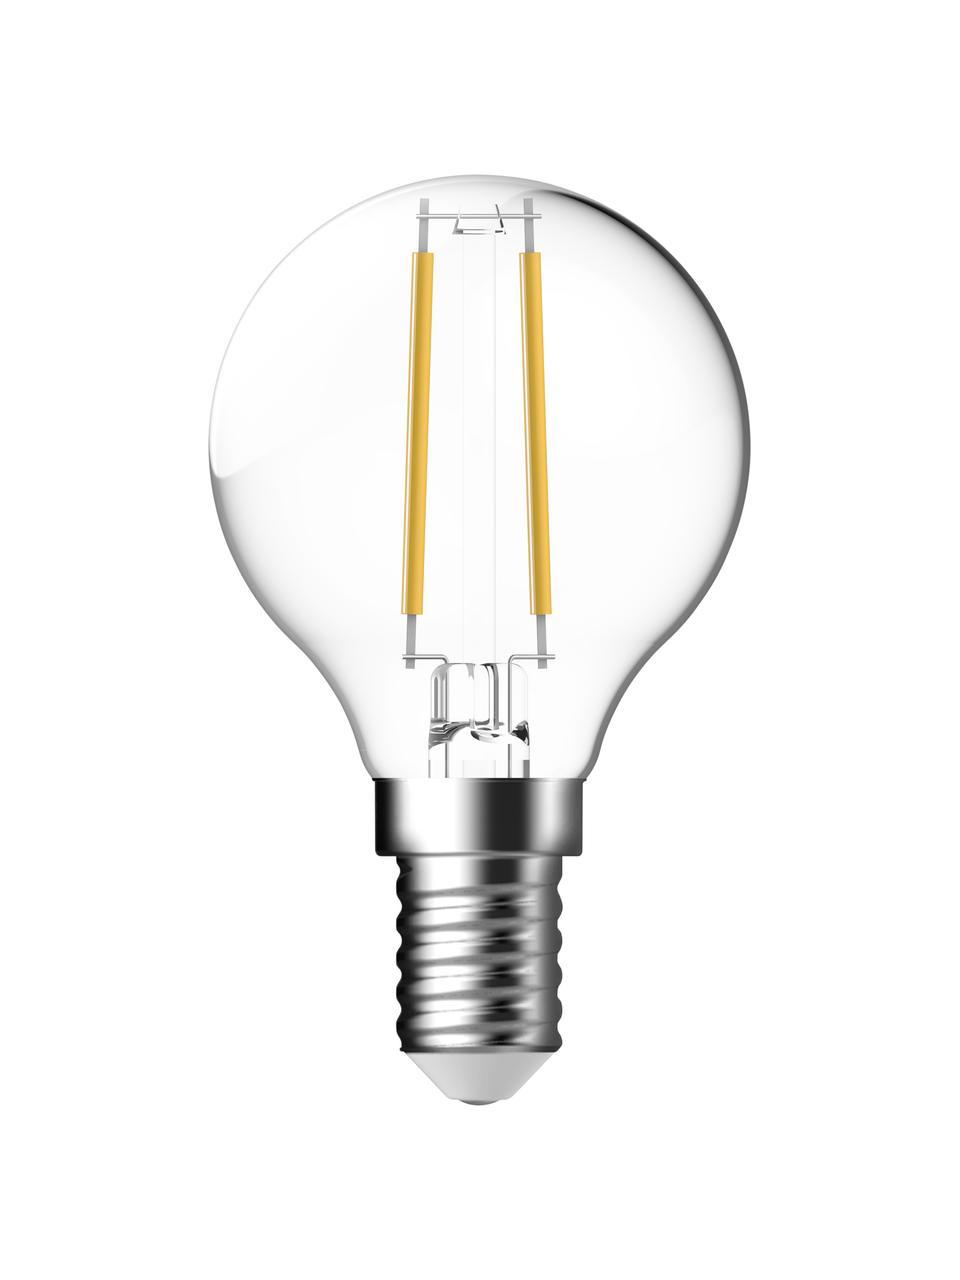 Lampadina E14, 2,5W, bianco caldo, 6 pz, Paralume: vetro, Base lampadina: alluminio, Trasparente, Ø 5 x Alt. 8 cm